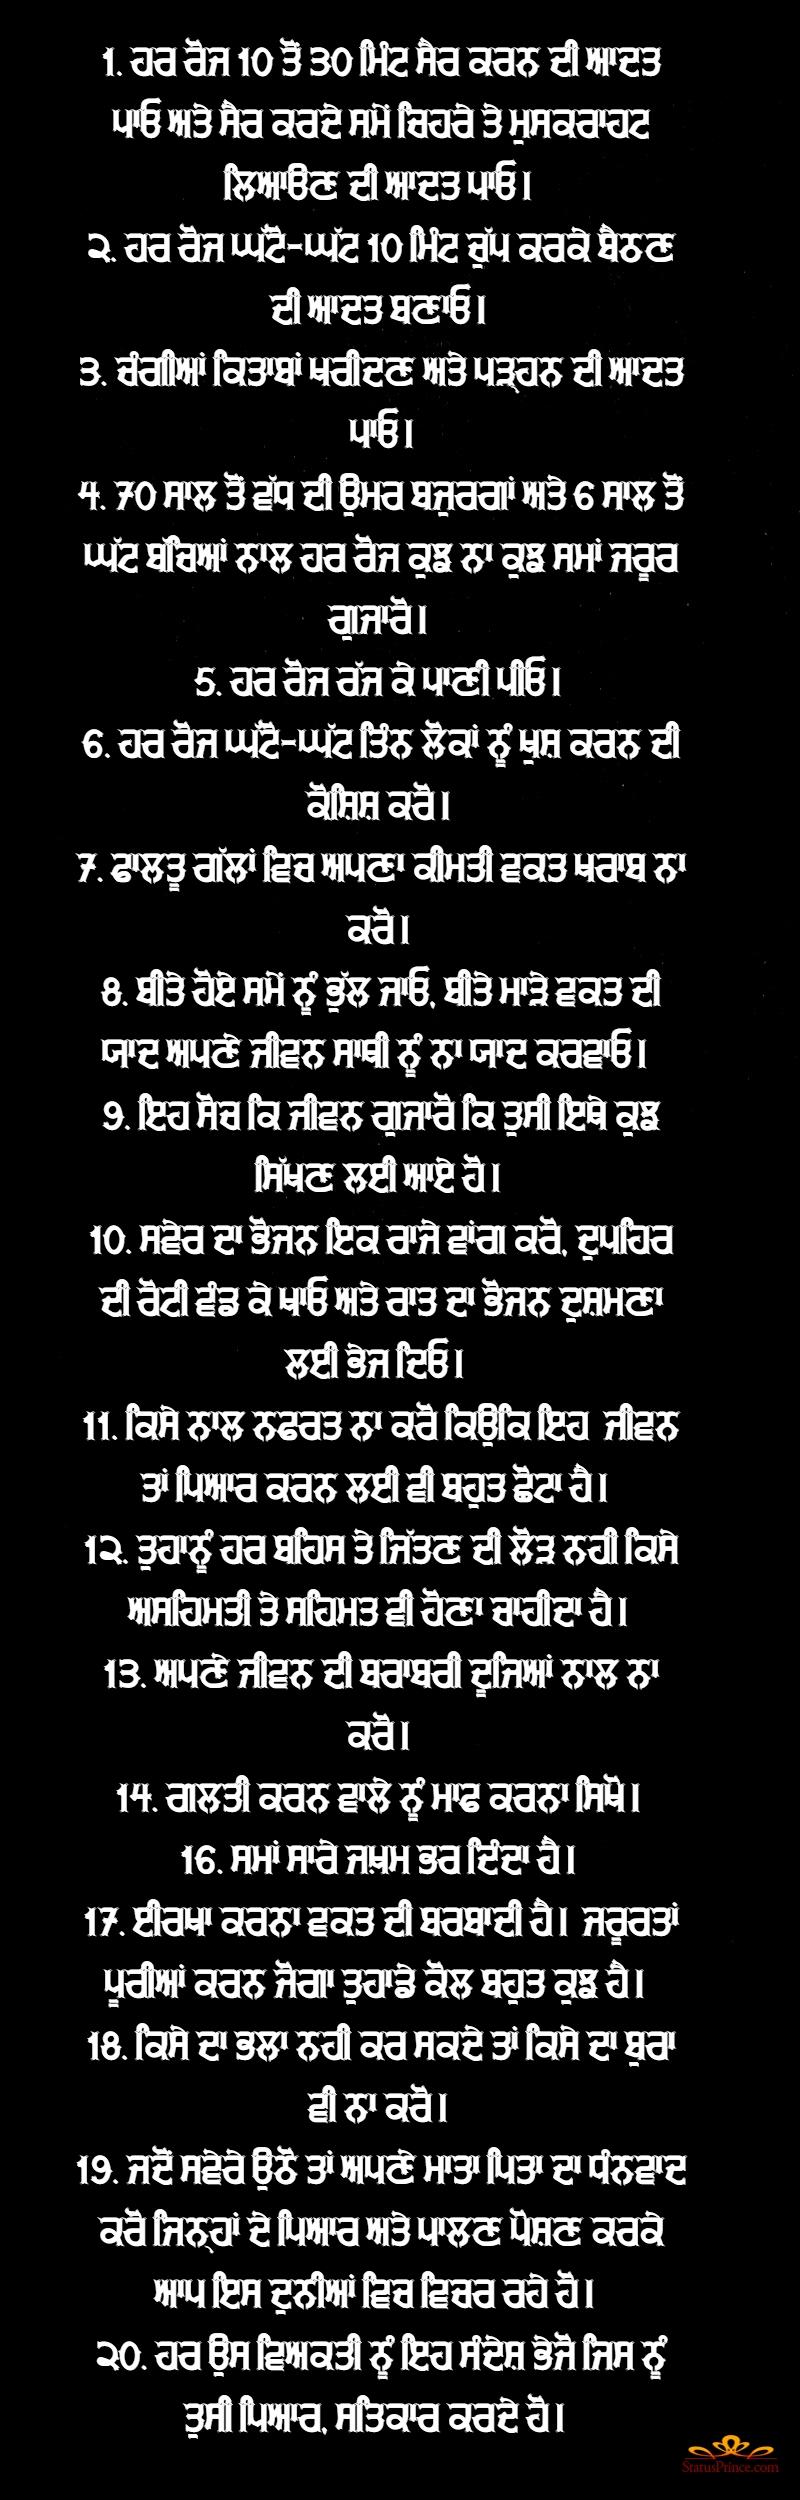 Punjabi Long messages and Punjabi Stories wallpaper